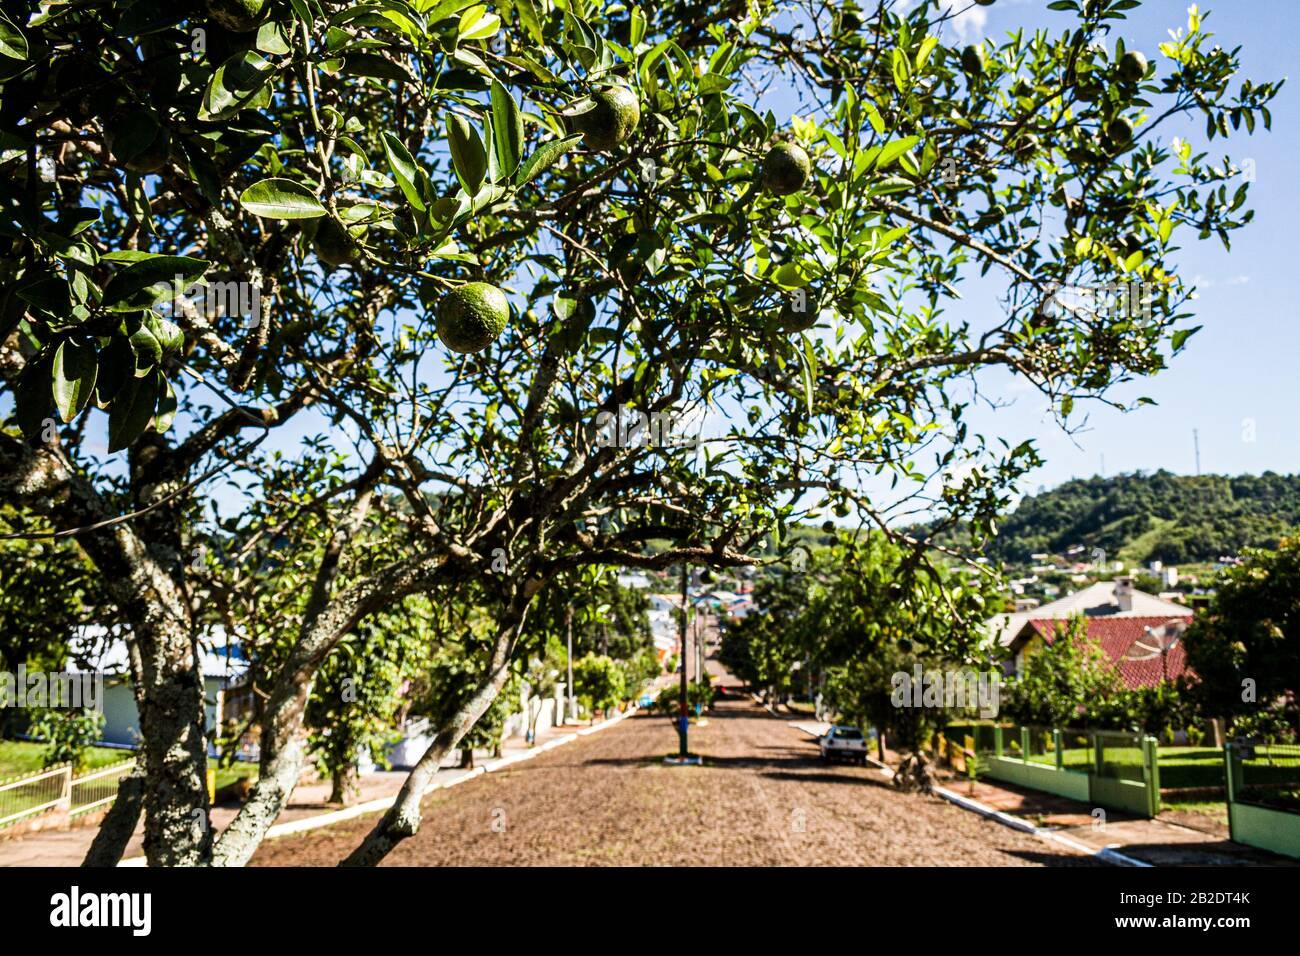 Mondaí Santa Catarina fonte: c8.alamy.com